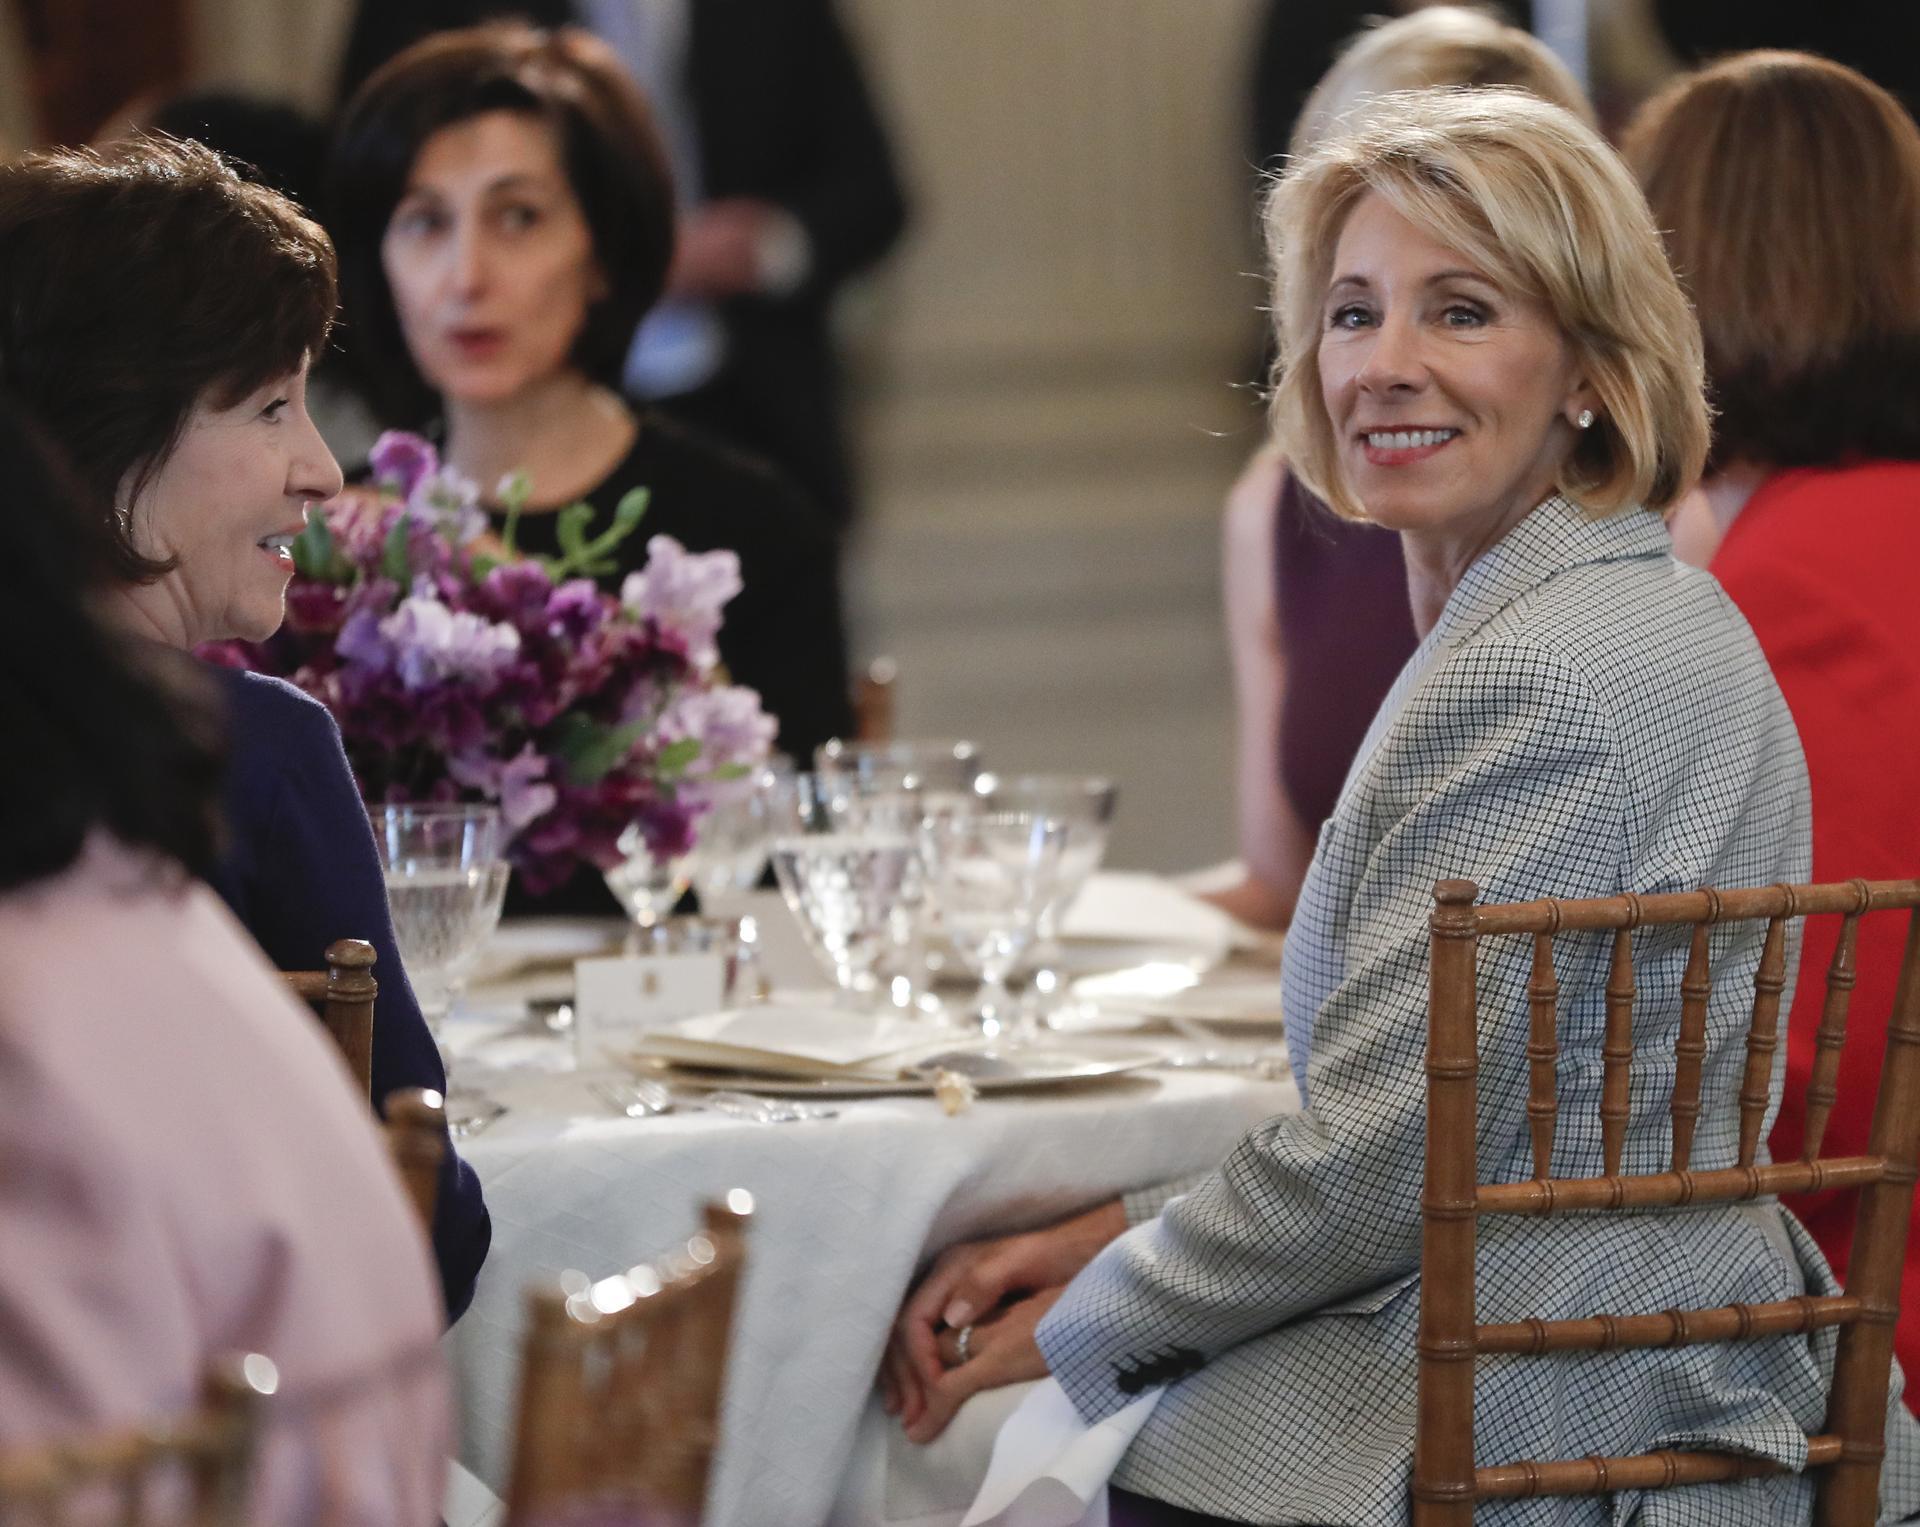 Hasil gambar untuk President Trump has lunch with Vice President Pence and Secretary of Education Betsy DeVos